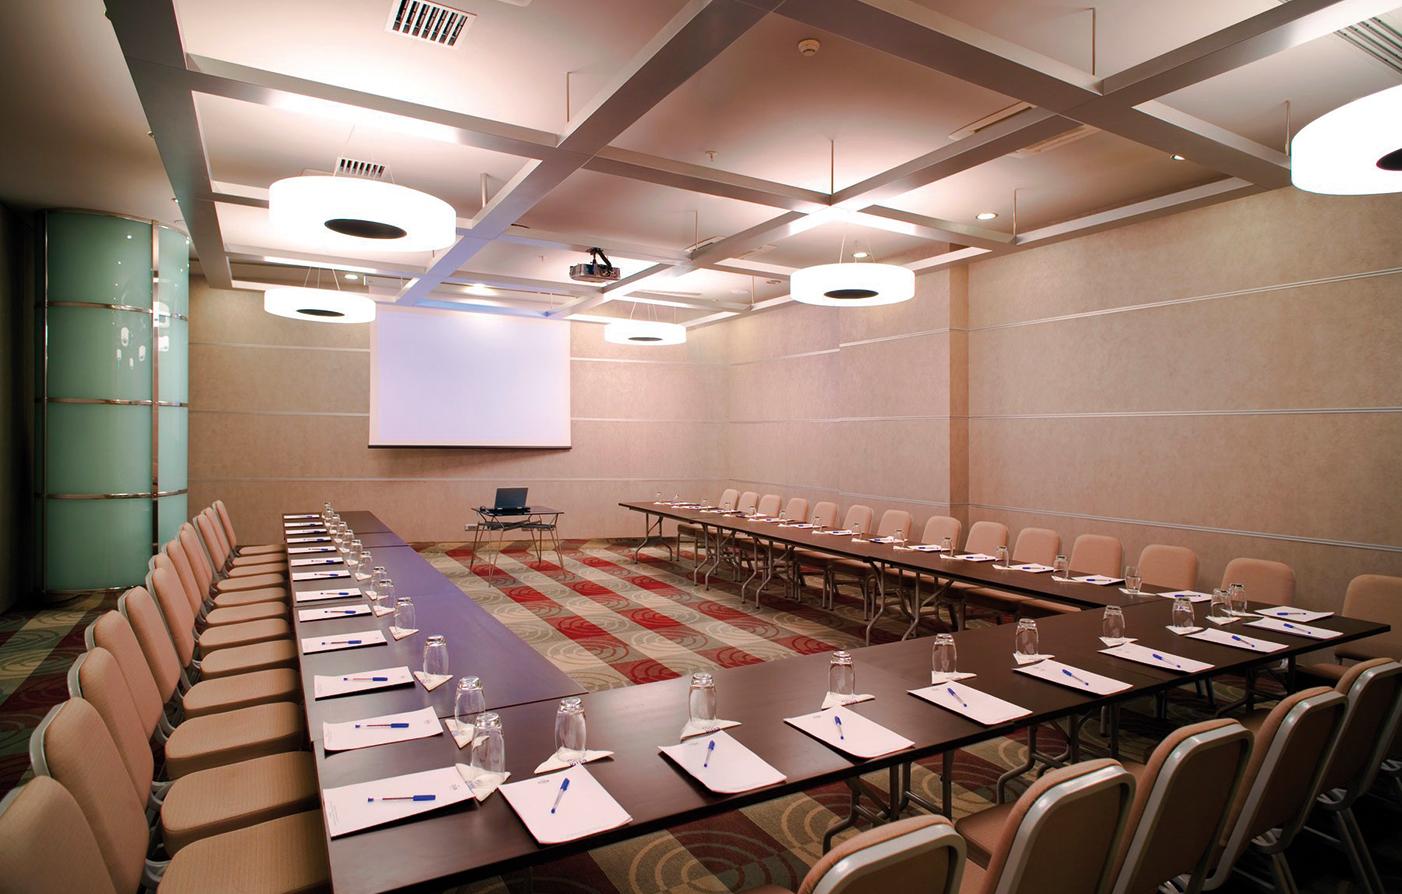 Divan ankara ankara hotel events for Divan hotel ankara